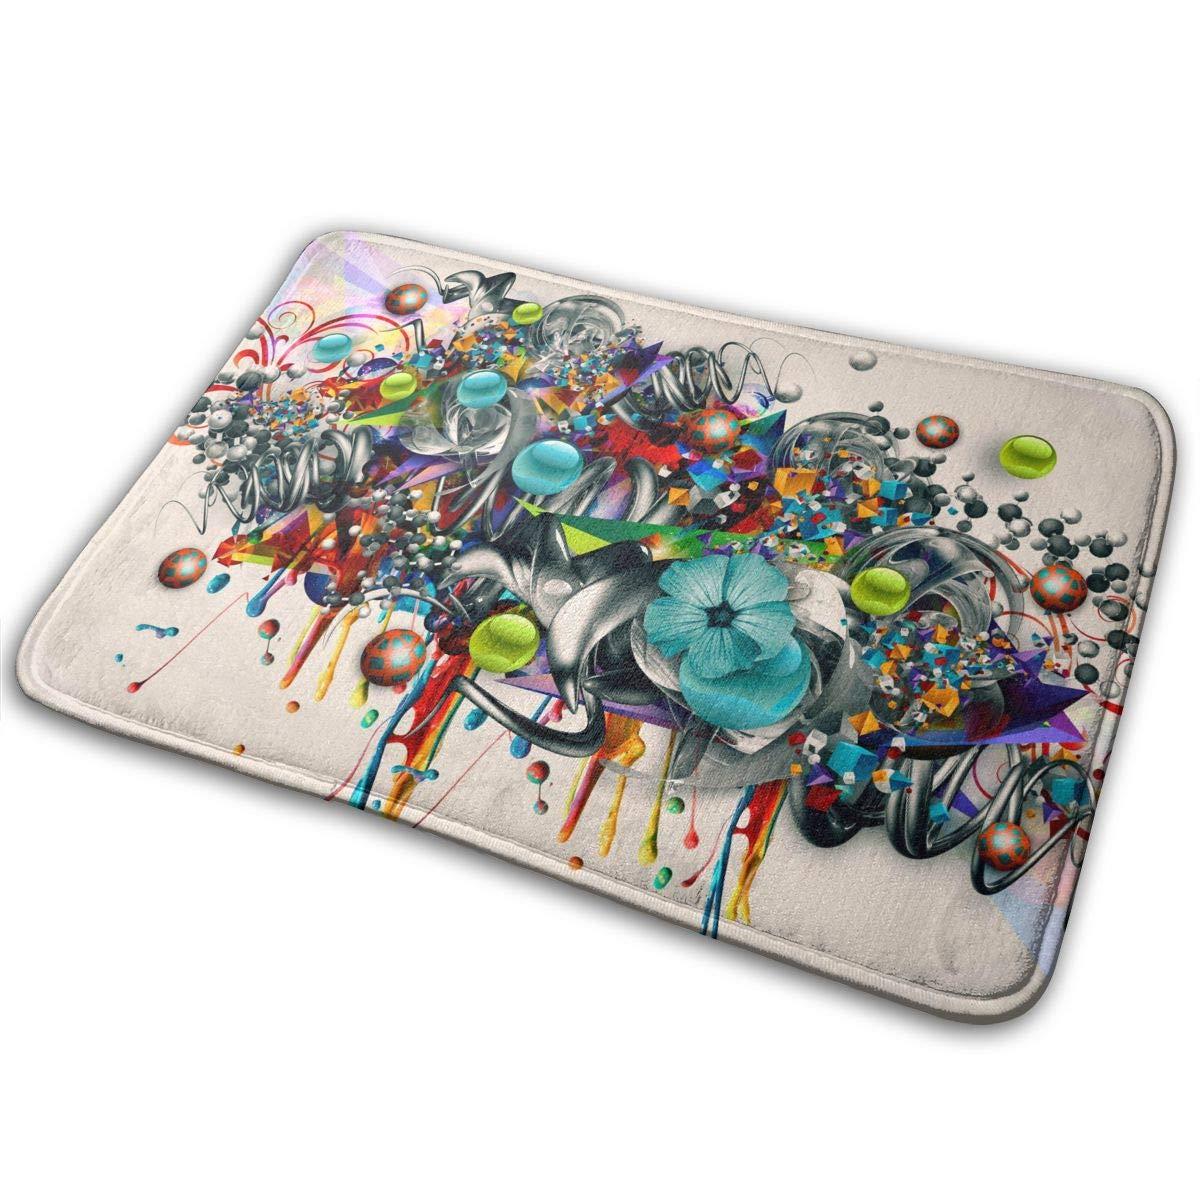 Amazon.com: Chappie Abstract Graffiti Carpet Area Rug Soft ...